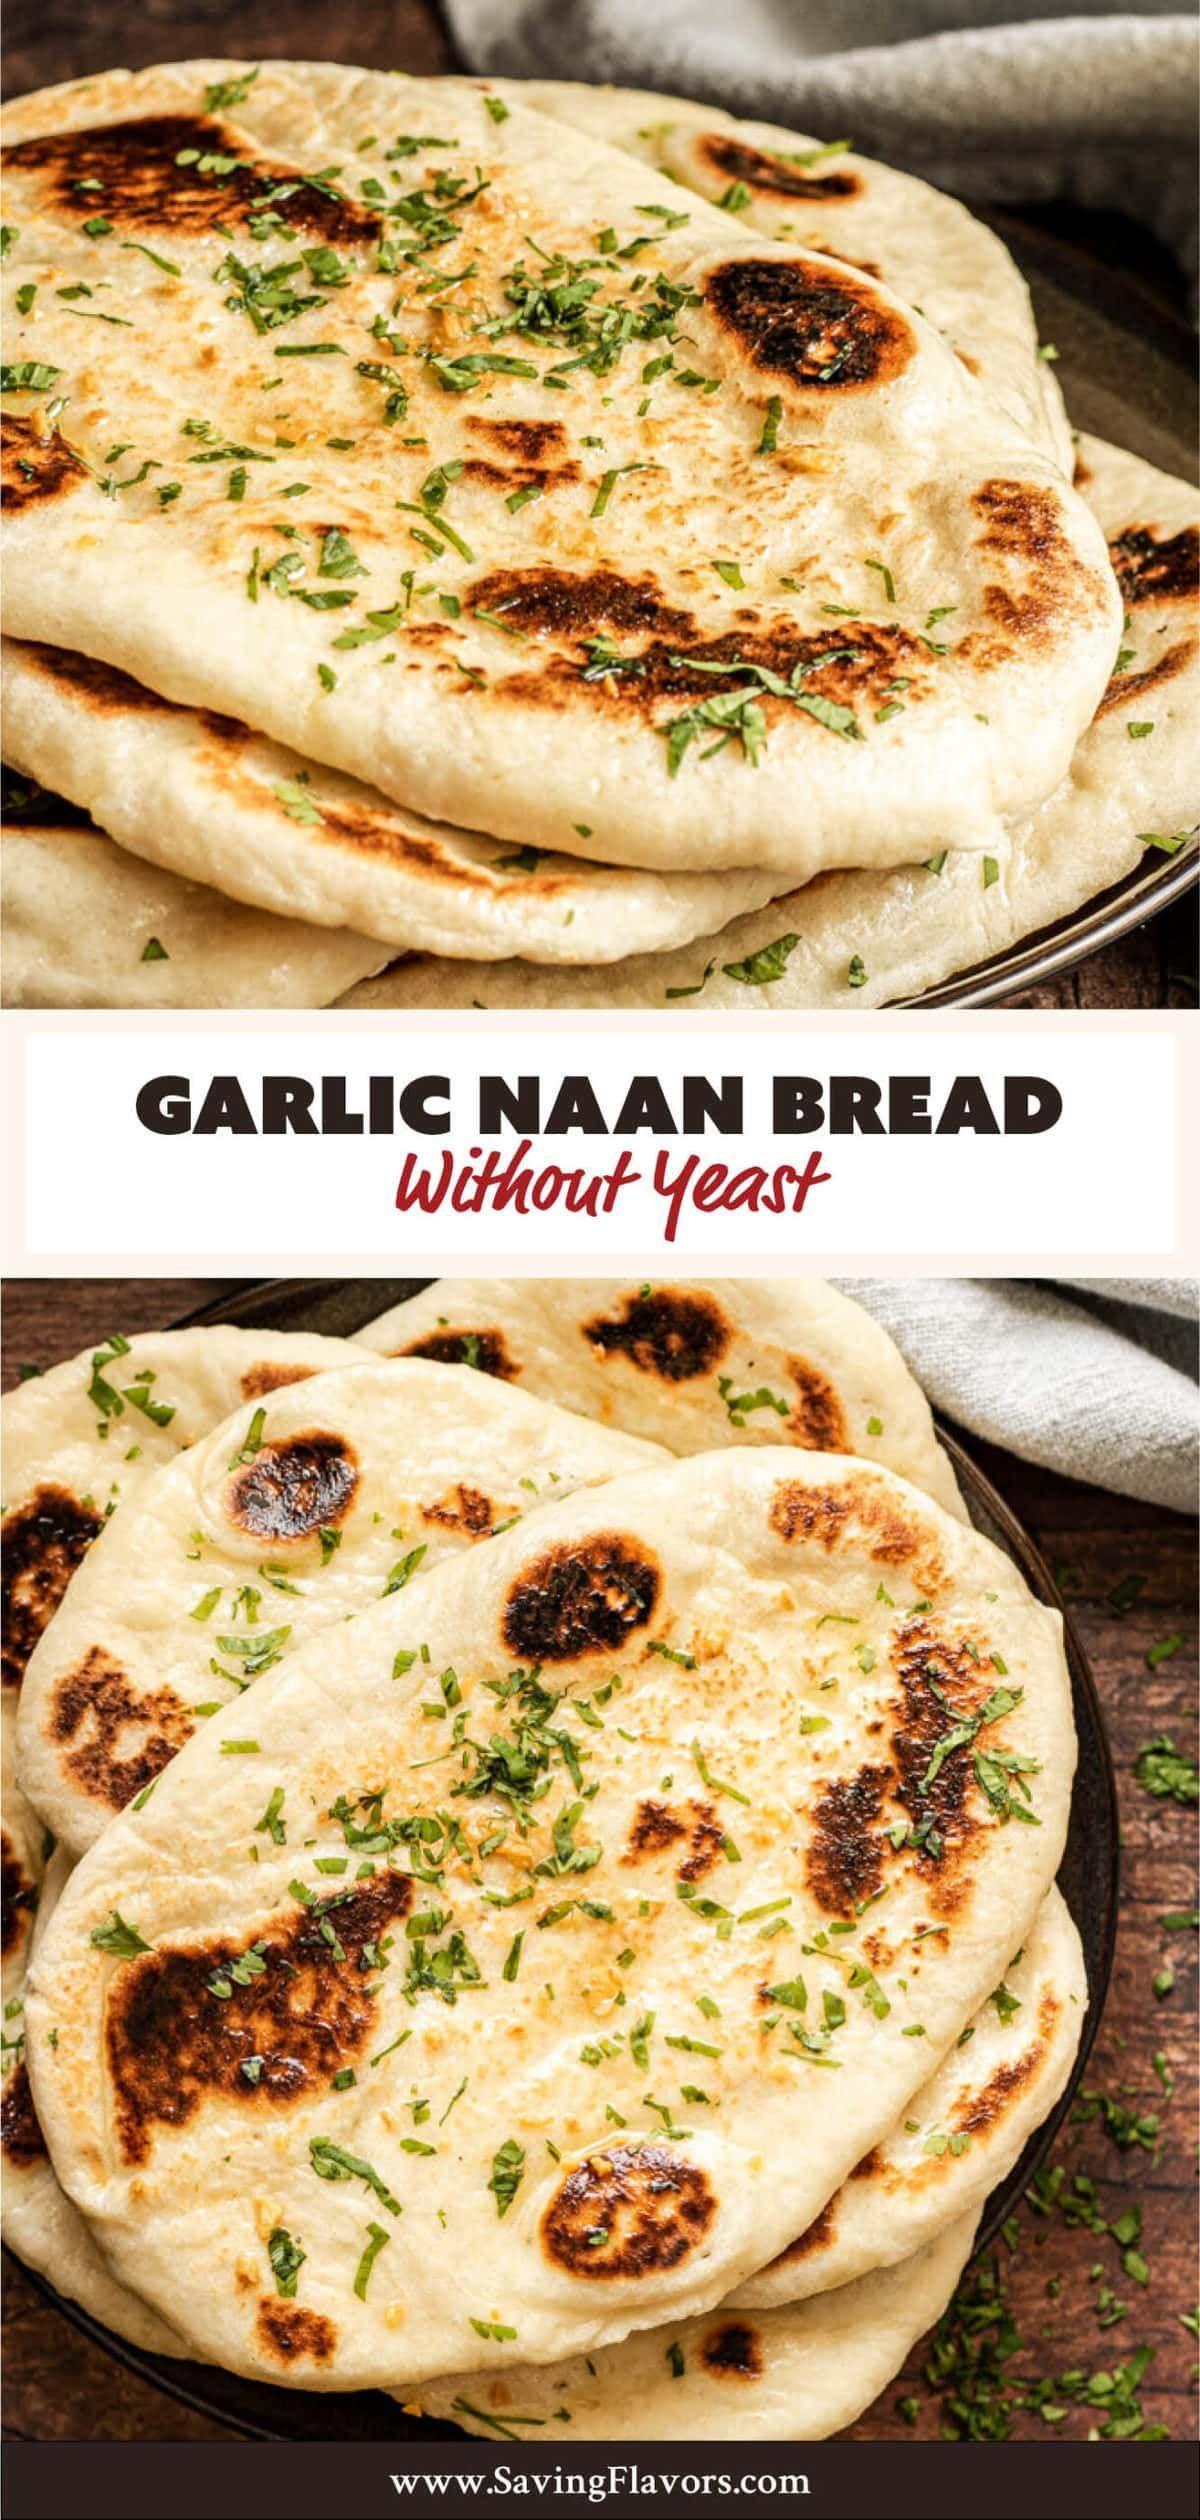 Garlic Naan Bread Recipe Without Yeast Saving Flavors Naan Bread Bread Without Yeast Garlic Naan Bread Recipe